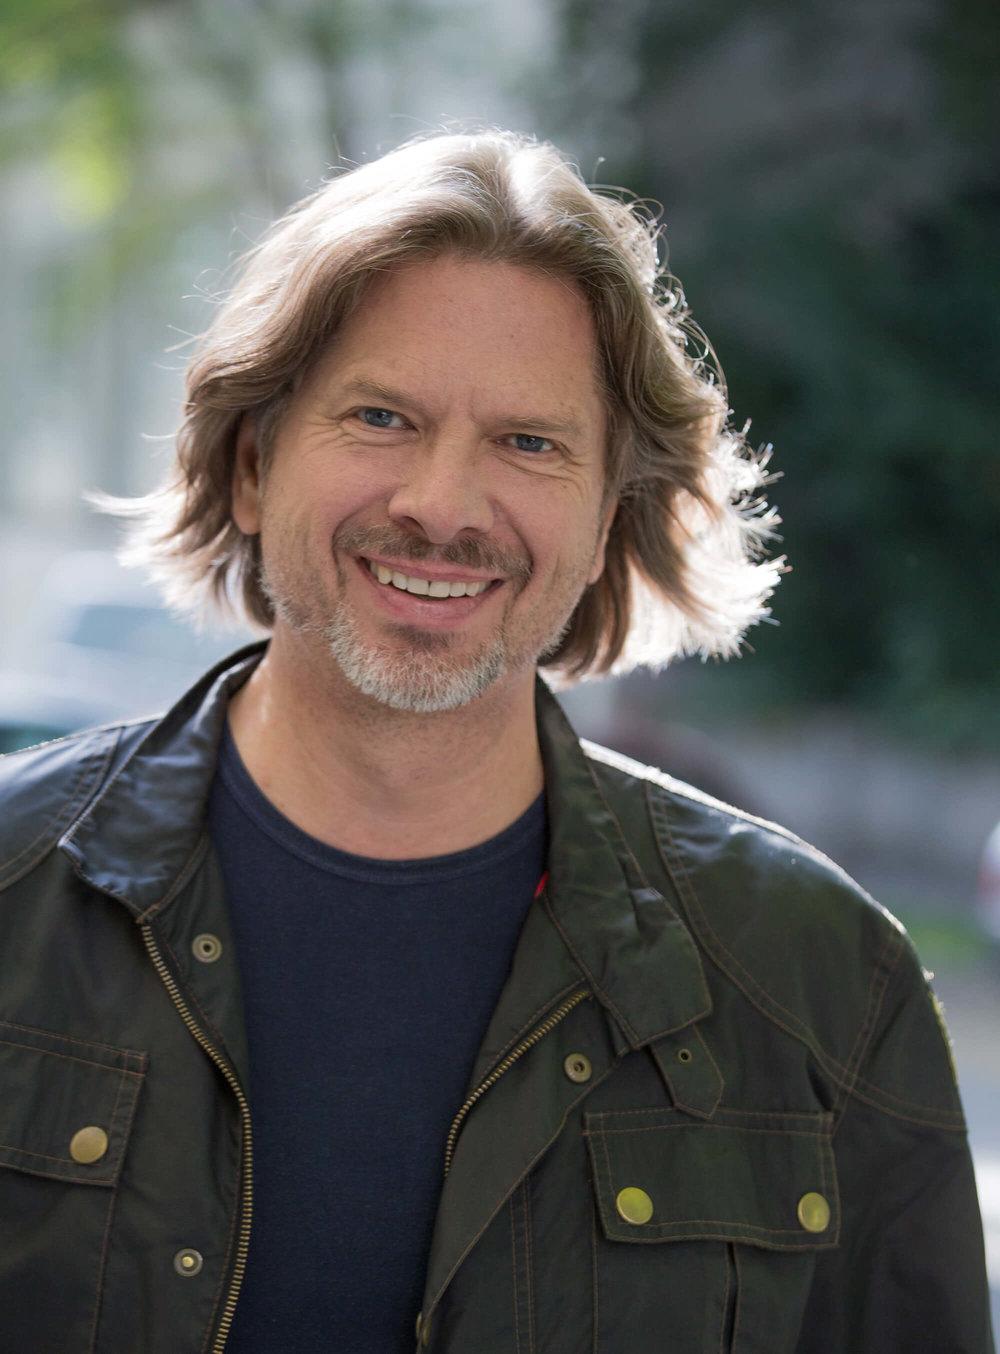 Joel Frederiksen_Portrait 1.jpg